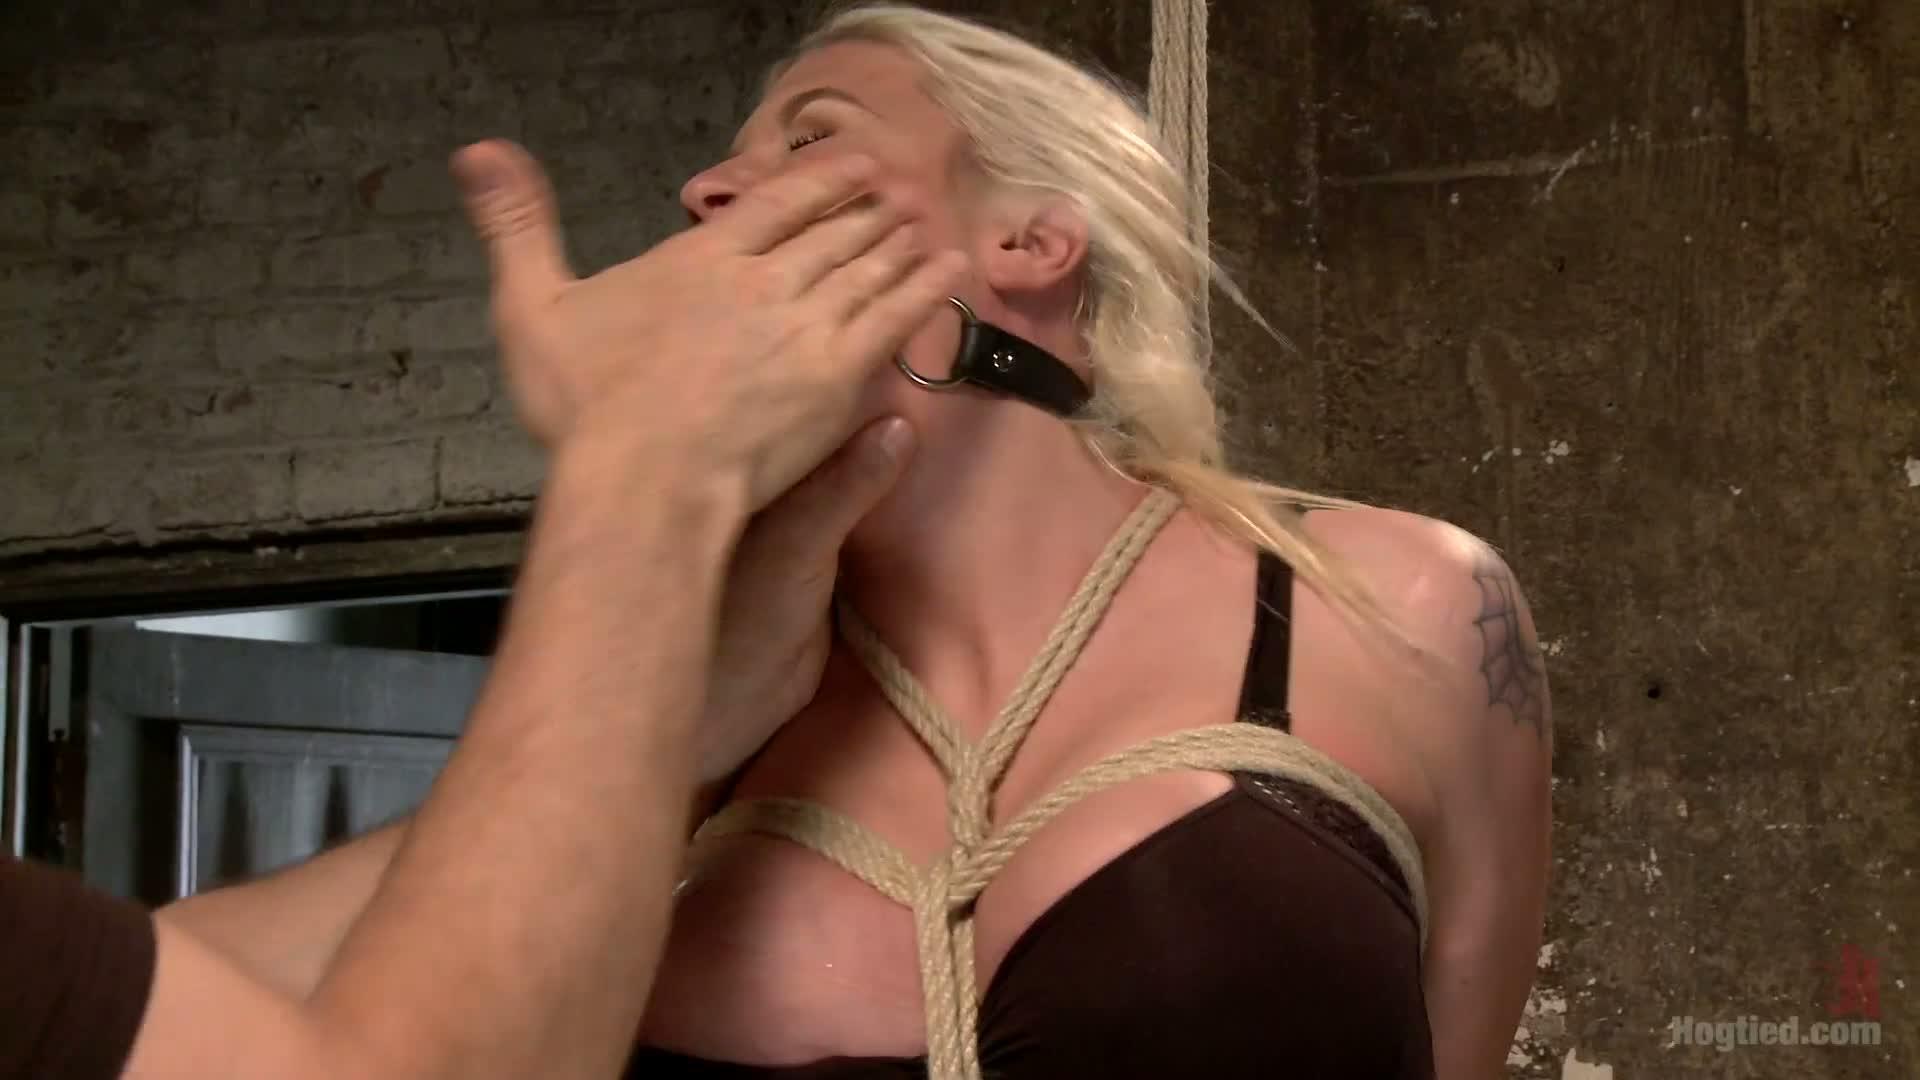 Double bondage girl video